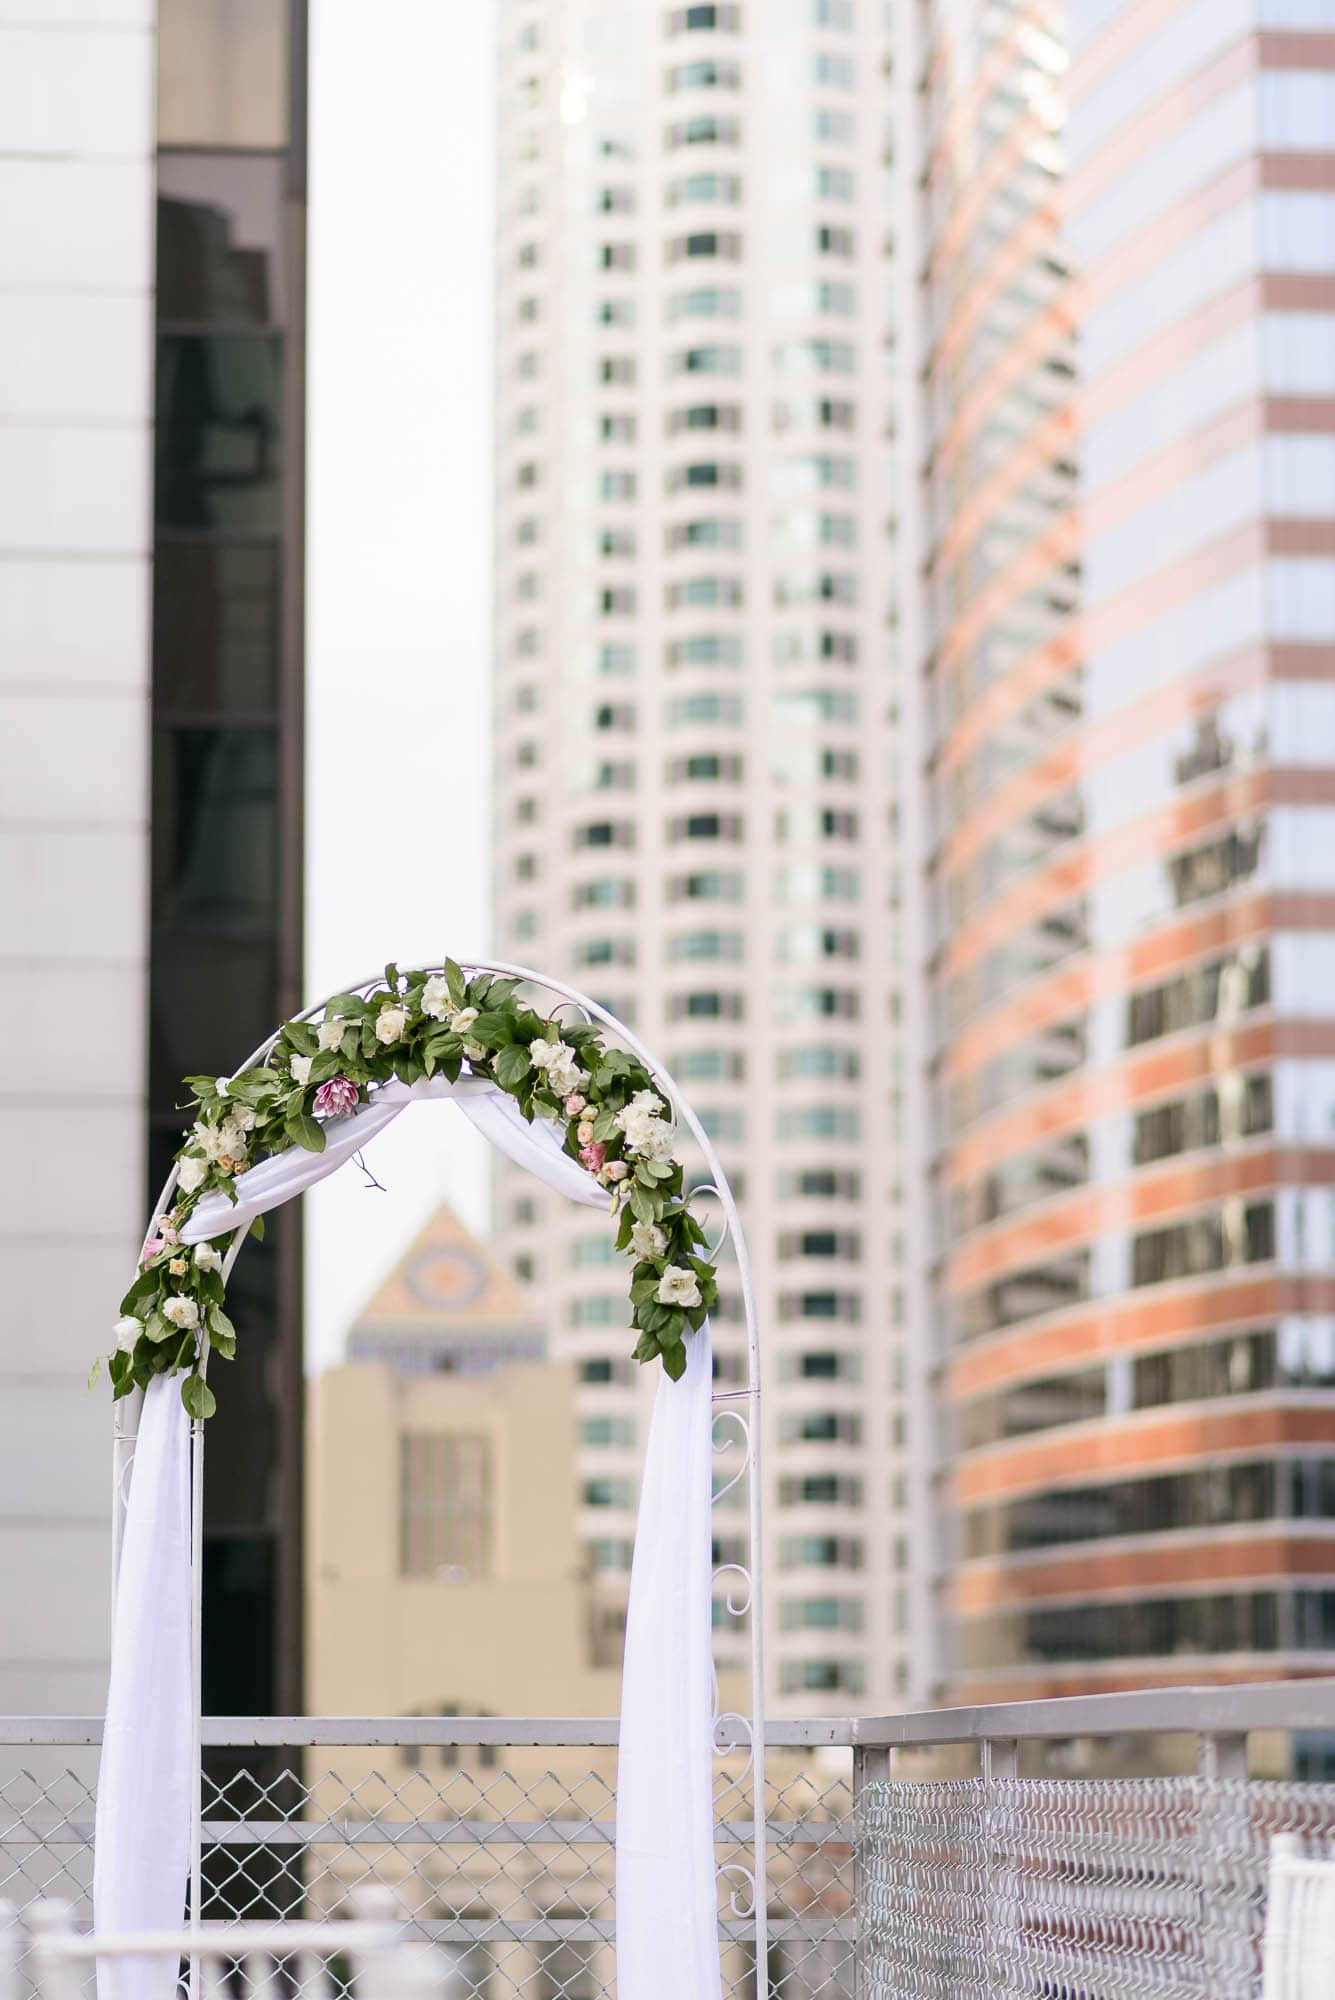 017_Alan_and_Heidi_Wedding_Nicole_Roman